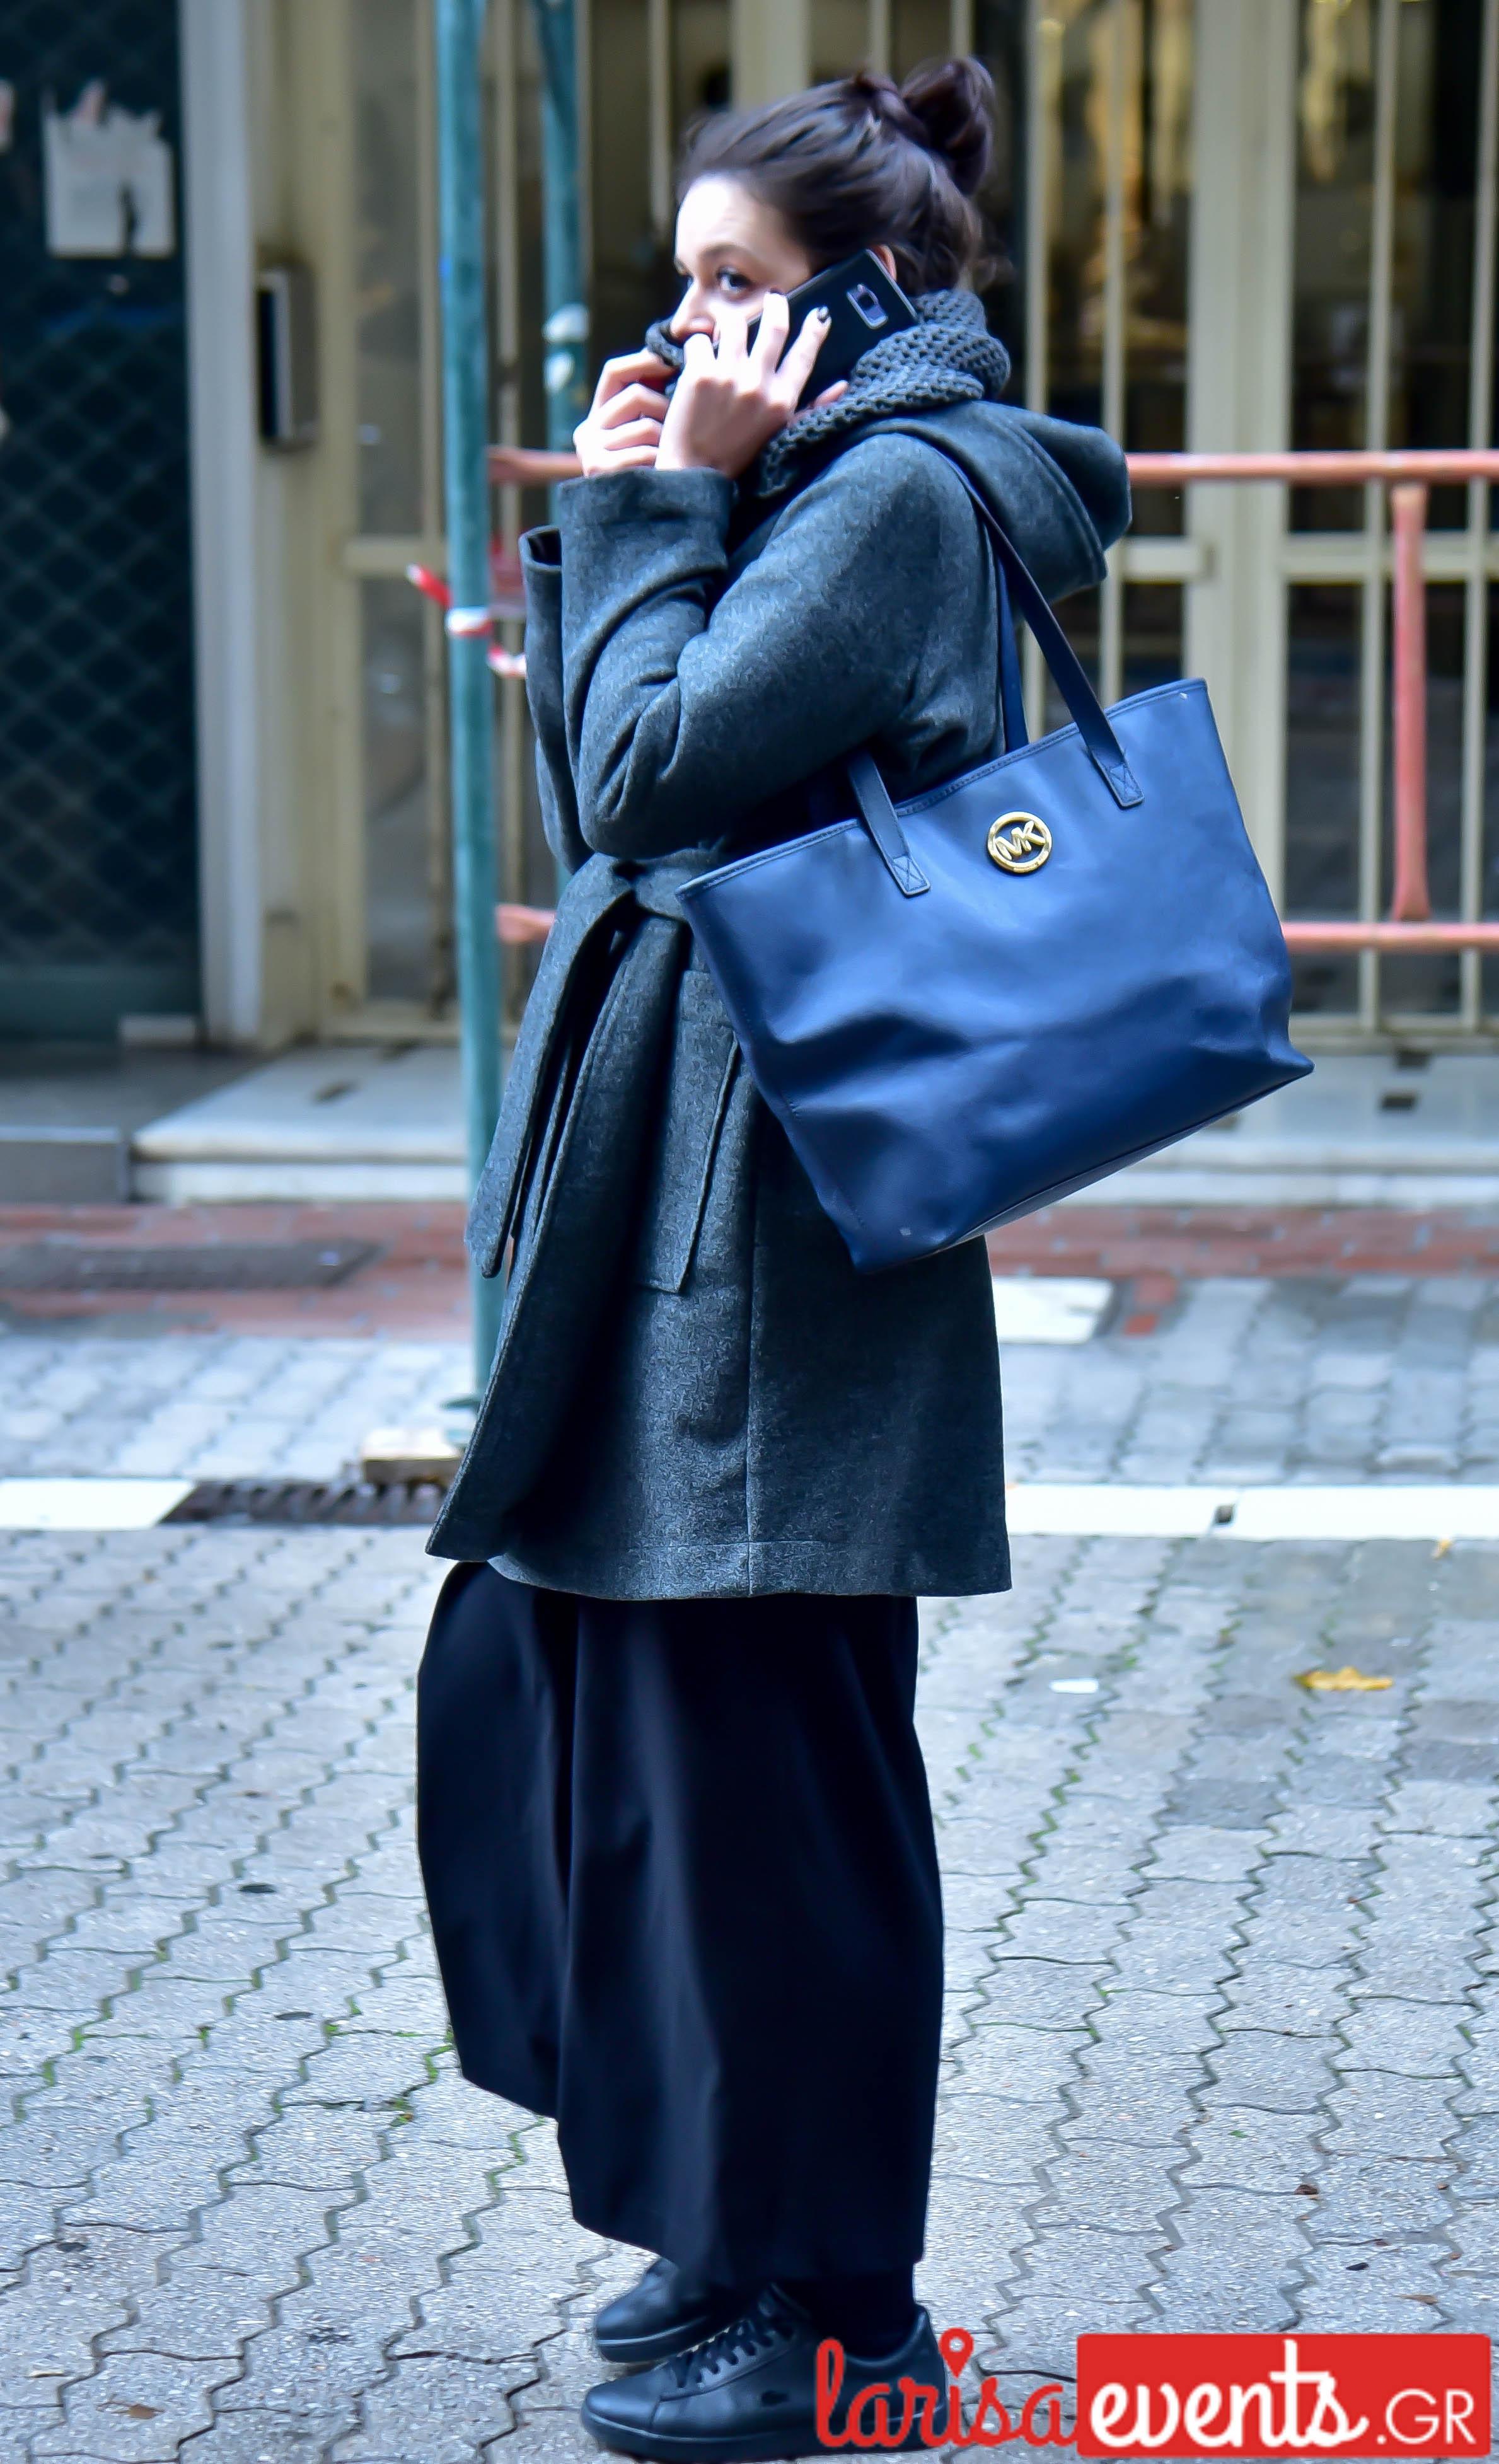 LAZ 6758 - Λάρισα's Street Style | Οι Λαρισαίοι σε street style clicks!